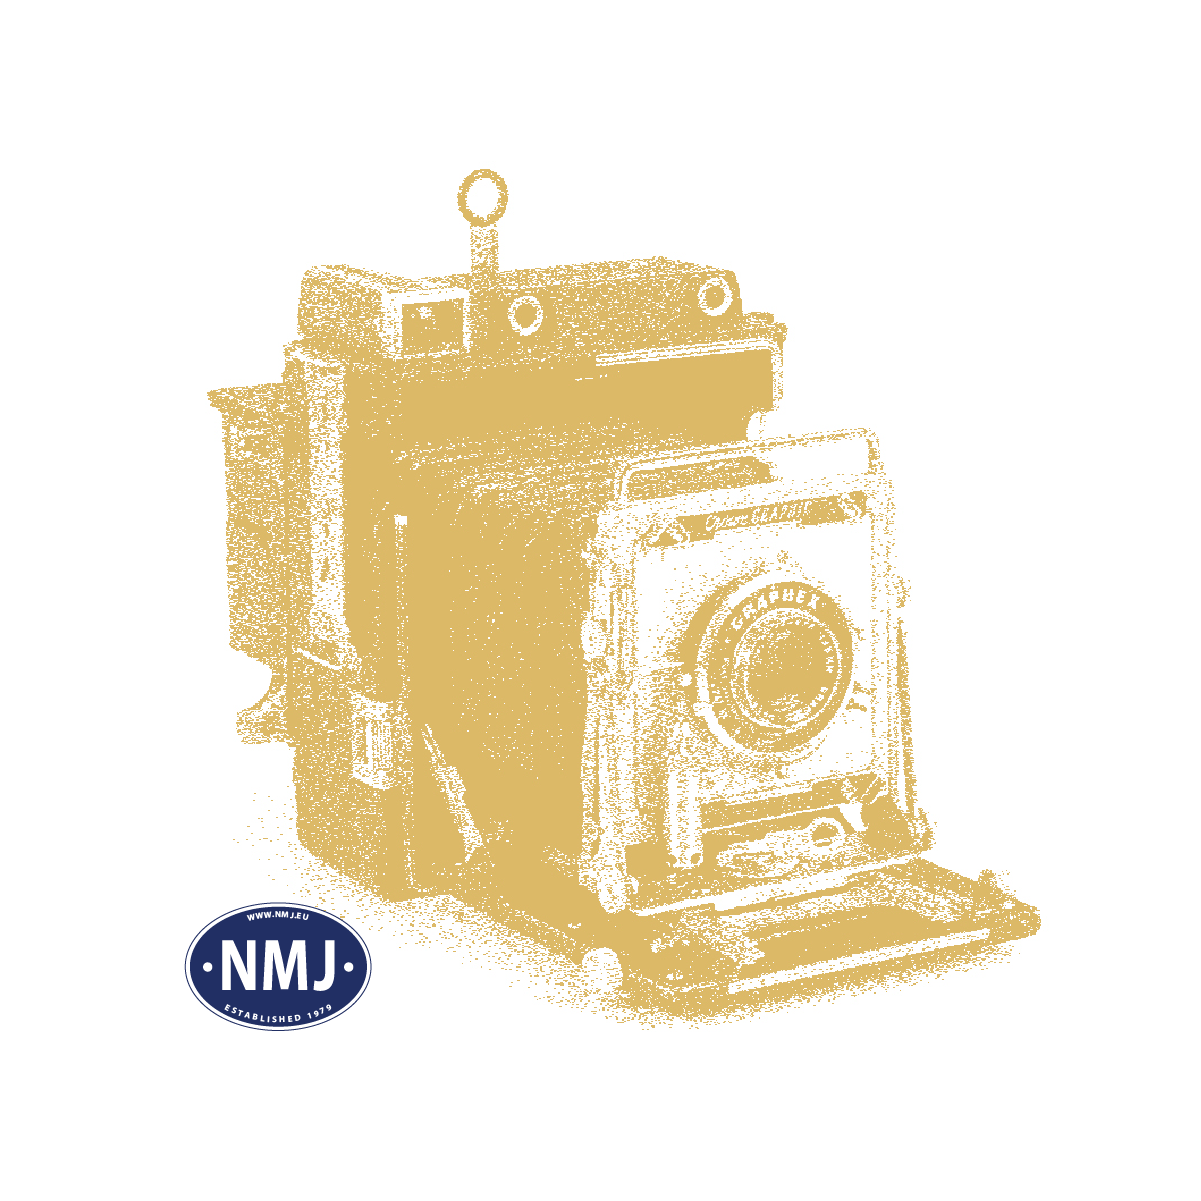 NOC15401 - Munker